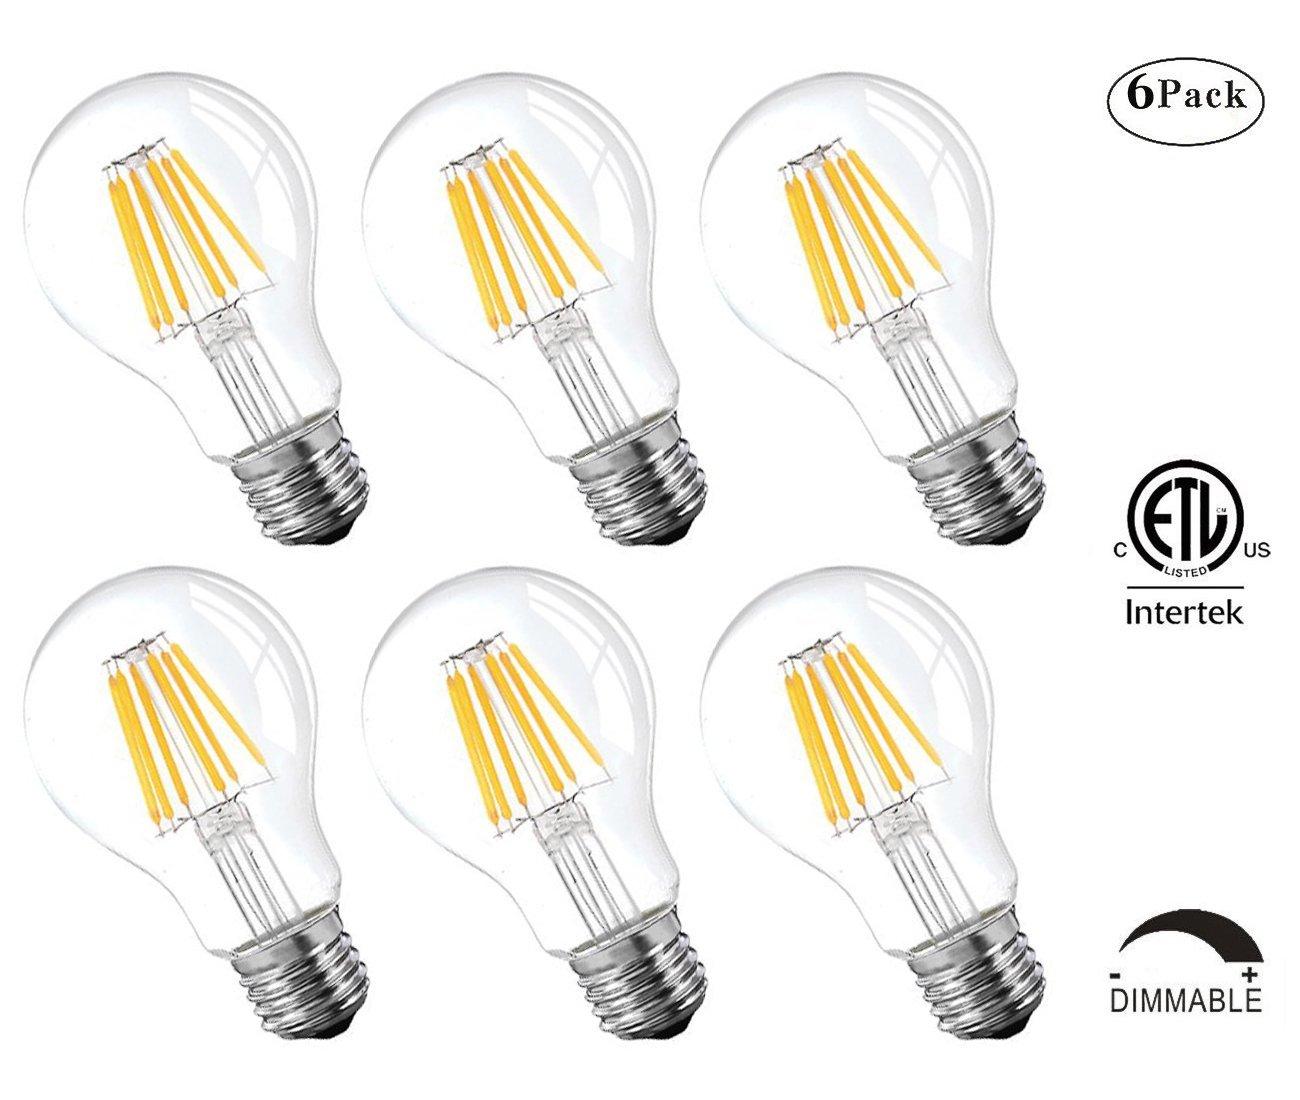 Dimmable LED Edison Bulbs,6W Antique LED Bulb,A19/A60 LED Light Bulb,Filament LED Bulbes,2700K Soft White,600 Lumens, Clear Glass Cover,6 Pack